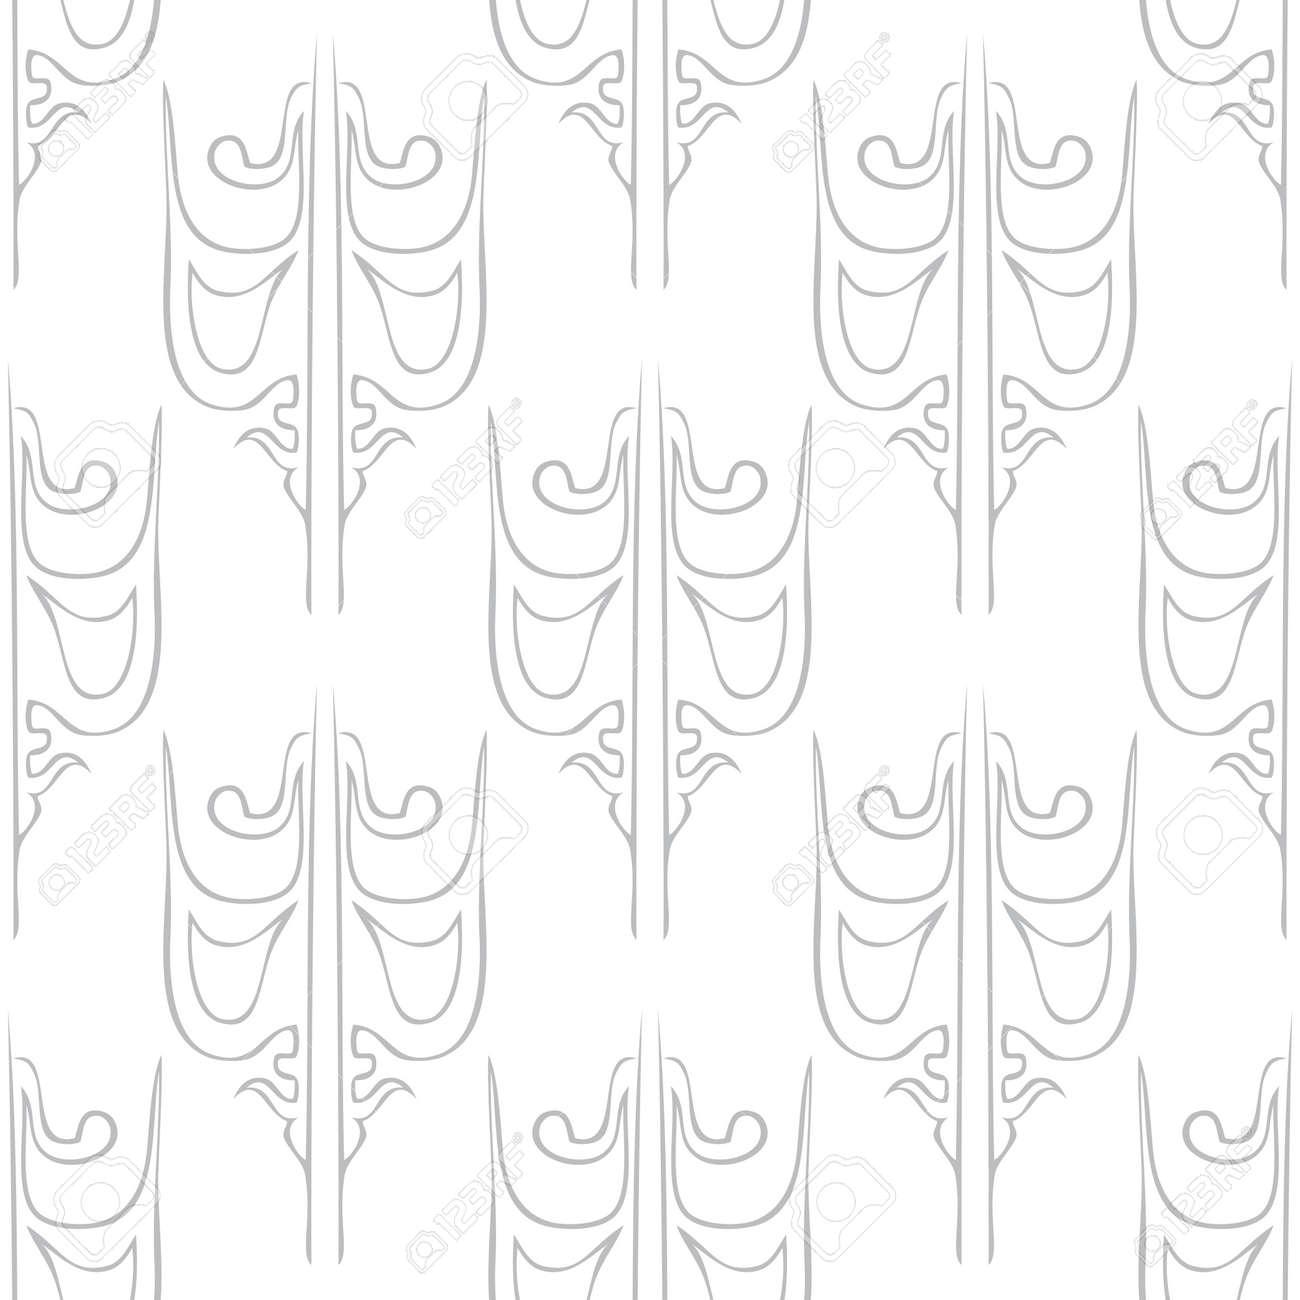 Seamless abstract vintage light gray pattern. Vector illustration Stock Vector - 92720620